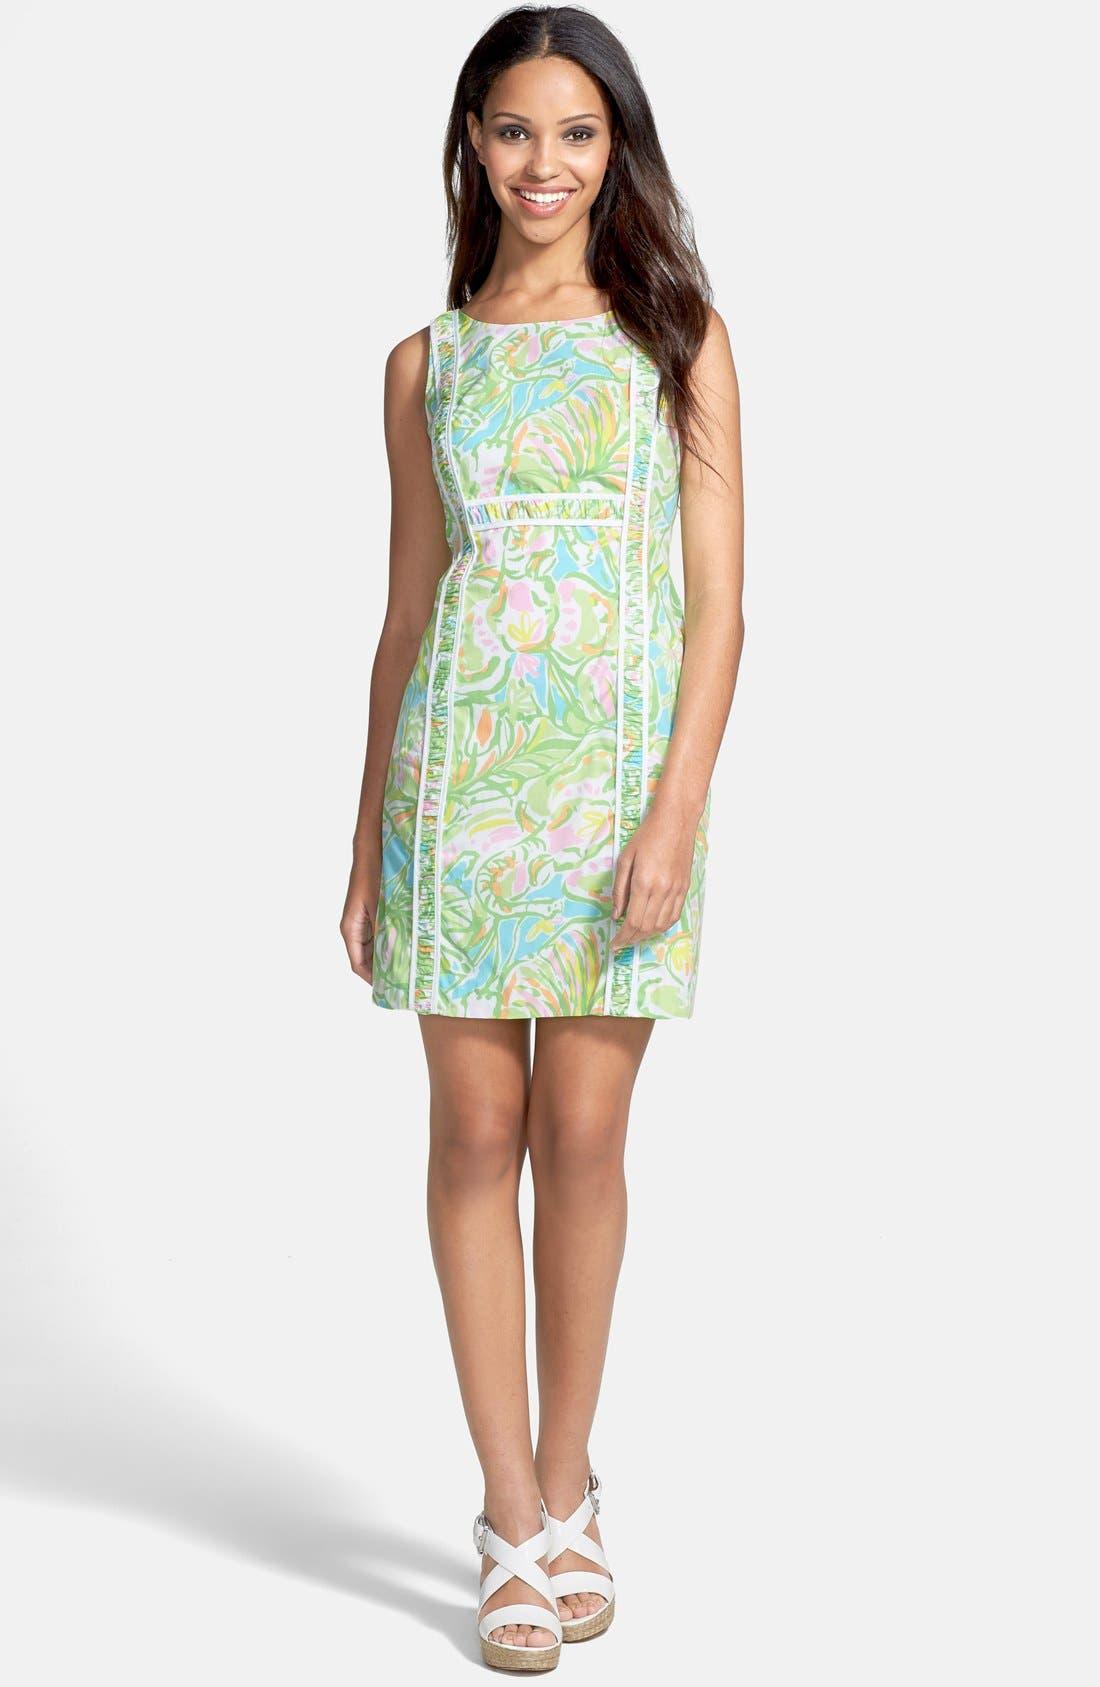 Alternate Image 1 Selected - Lilly Pulitzer® 'Fryer' Print Cotton Poplin Shift Dress